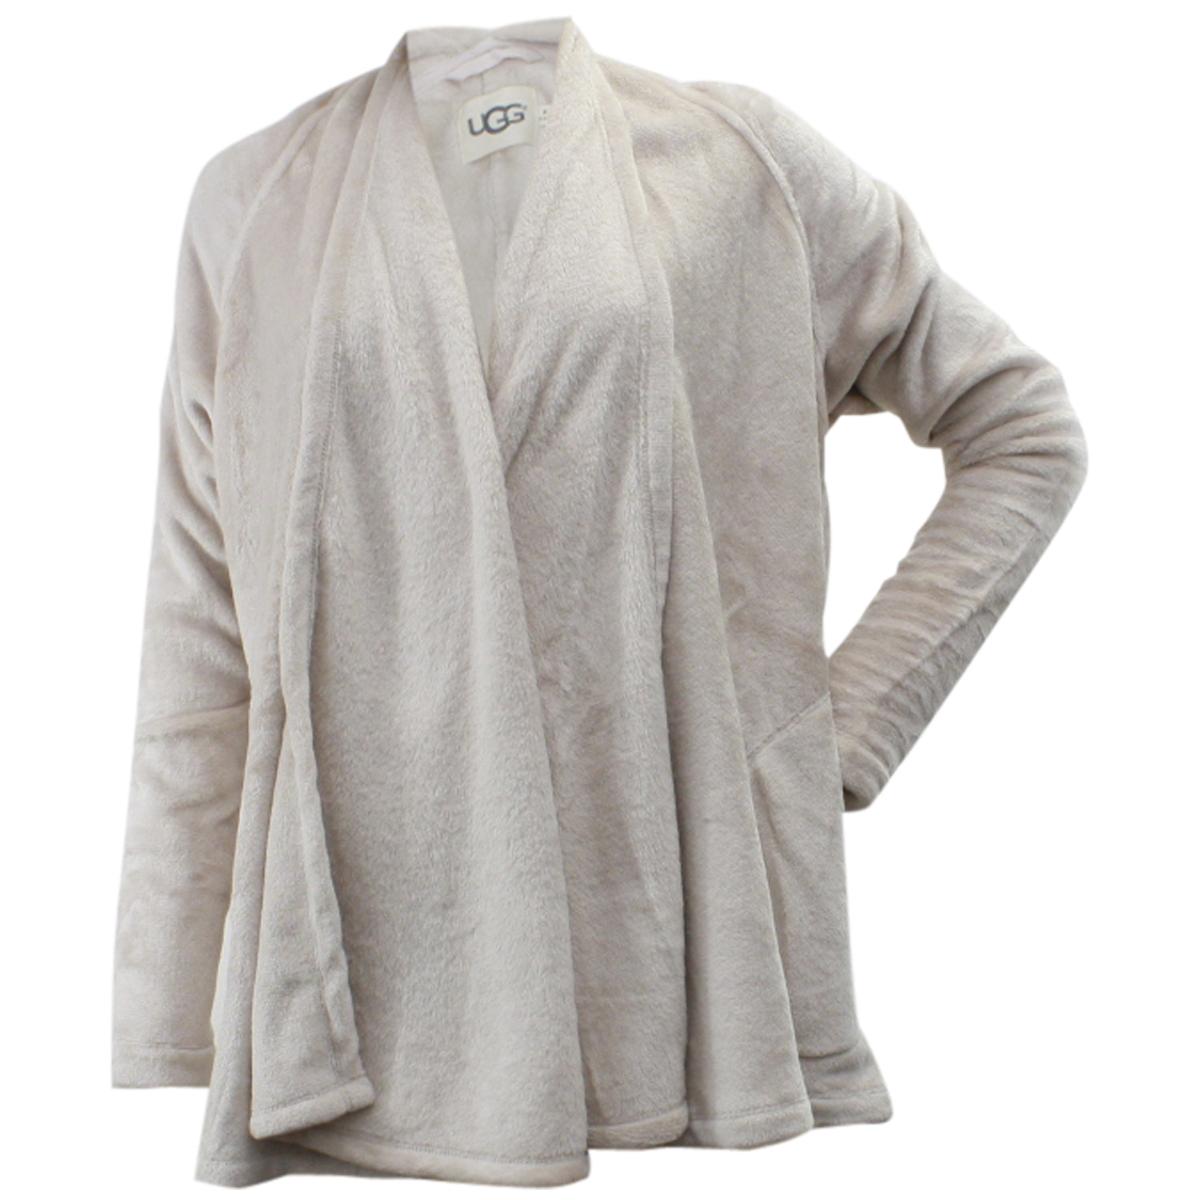 Ugg Women's Isla Draped Fleece Cardigan Sweater